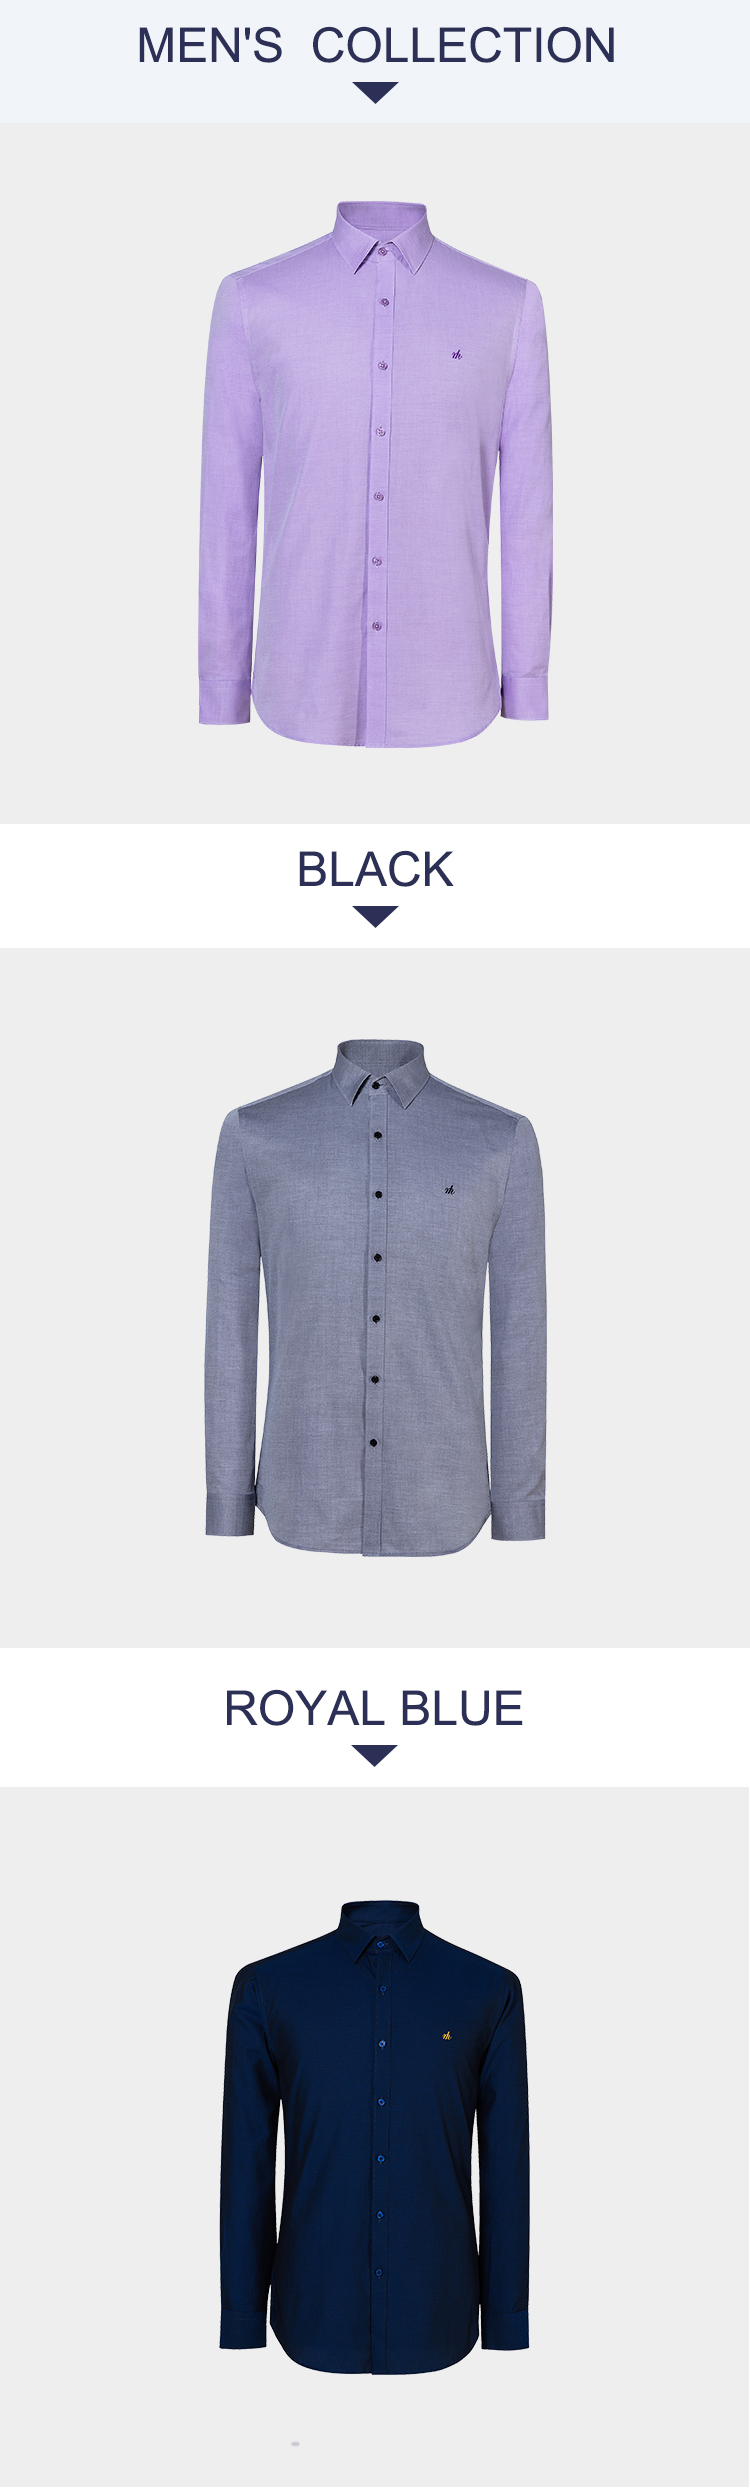 Compra Camisa blanca hombre algodón manga larga